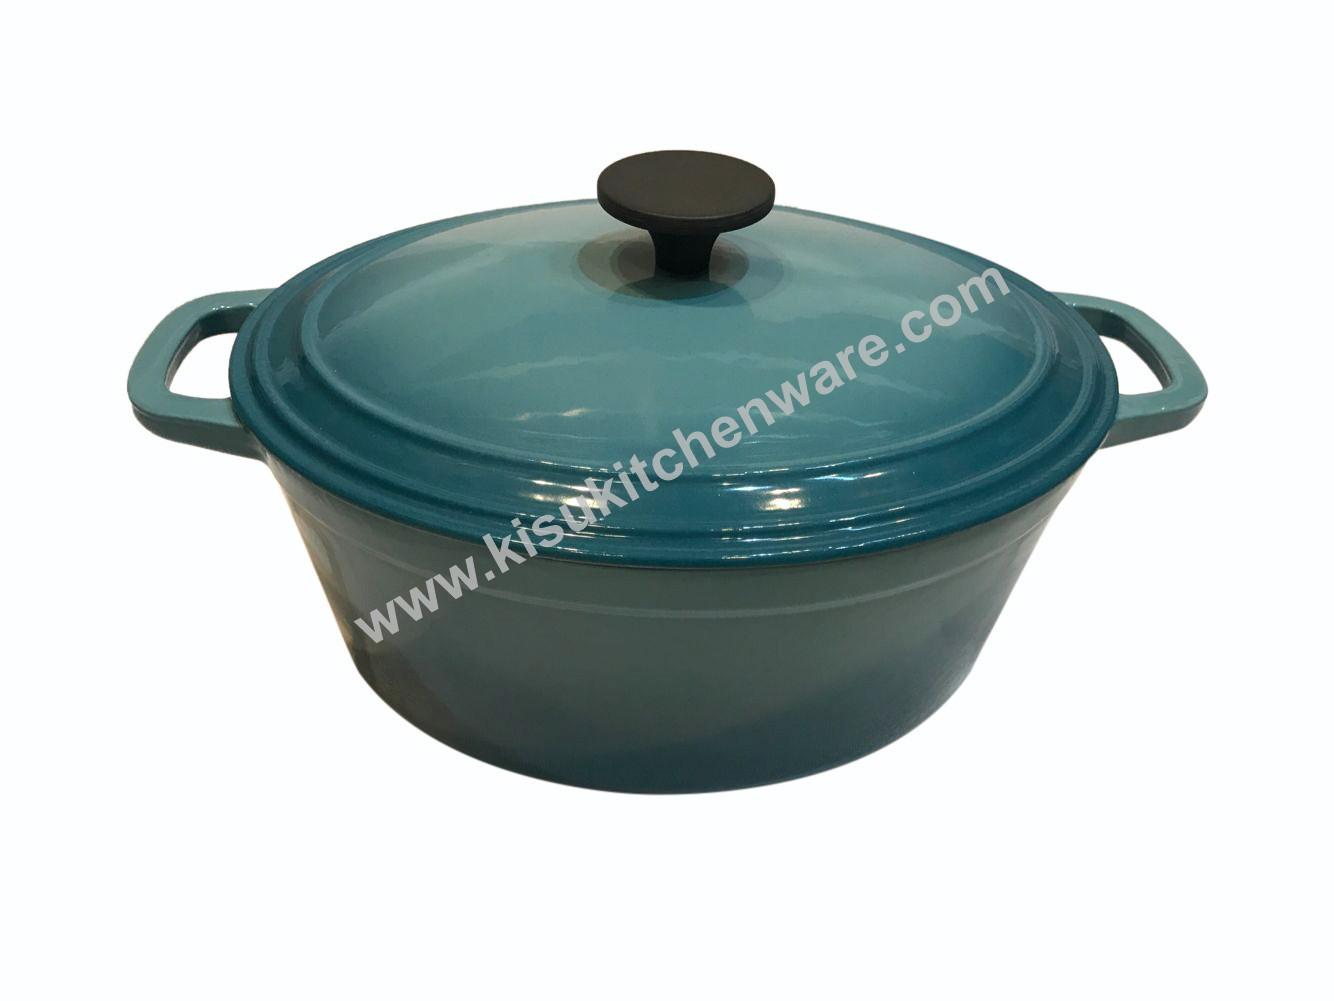 Cast iron oval casserole 5B29F10